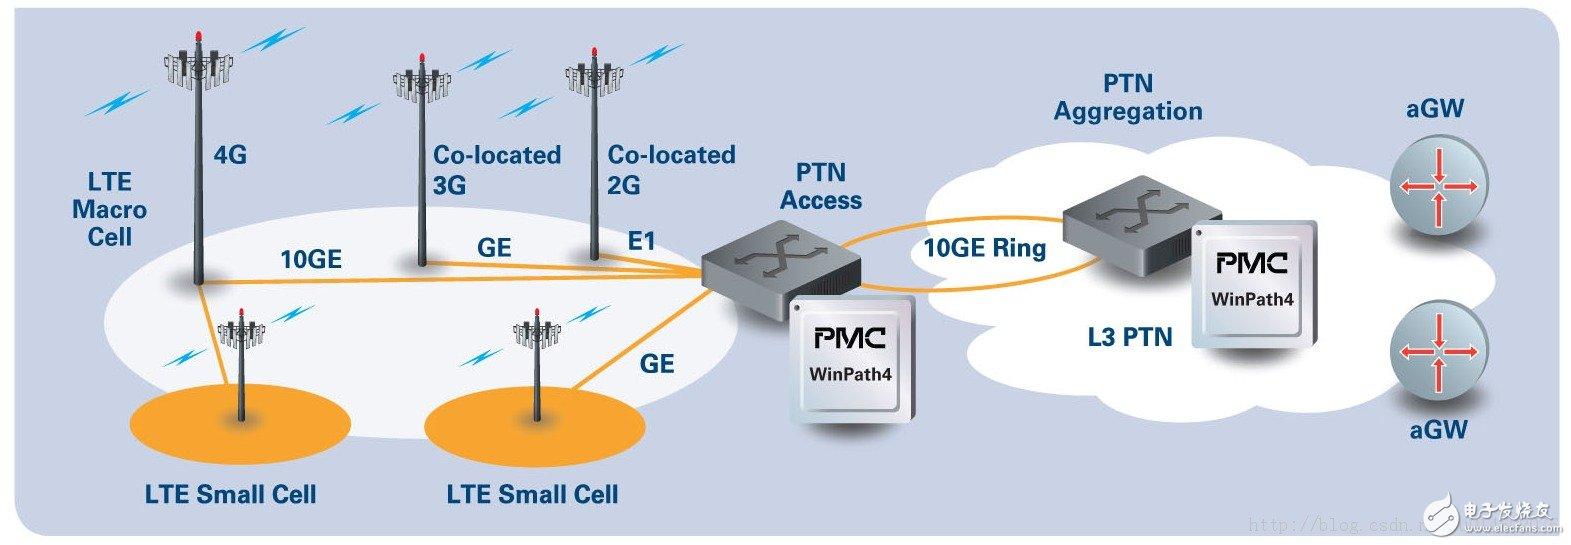 Figure 1 LTE backhaul network icon